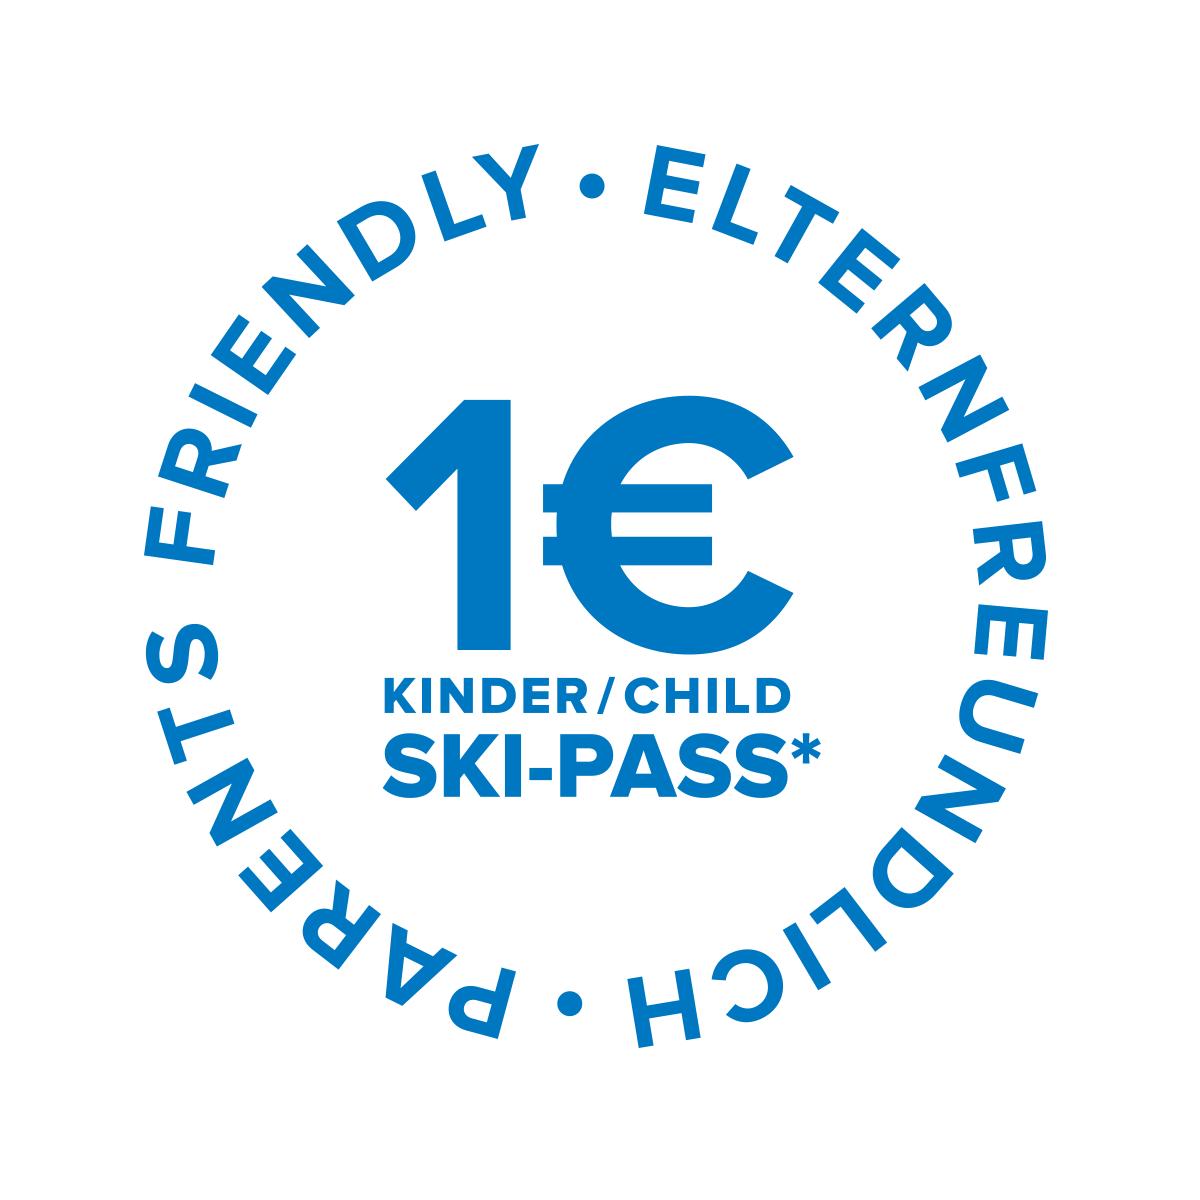 Kinderskipass Bad Kleinkirchheim - Familien Euro - Landhaus Apartment Prägant